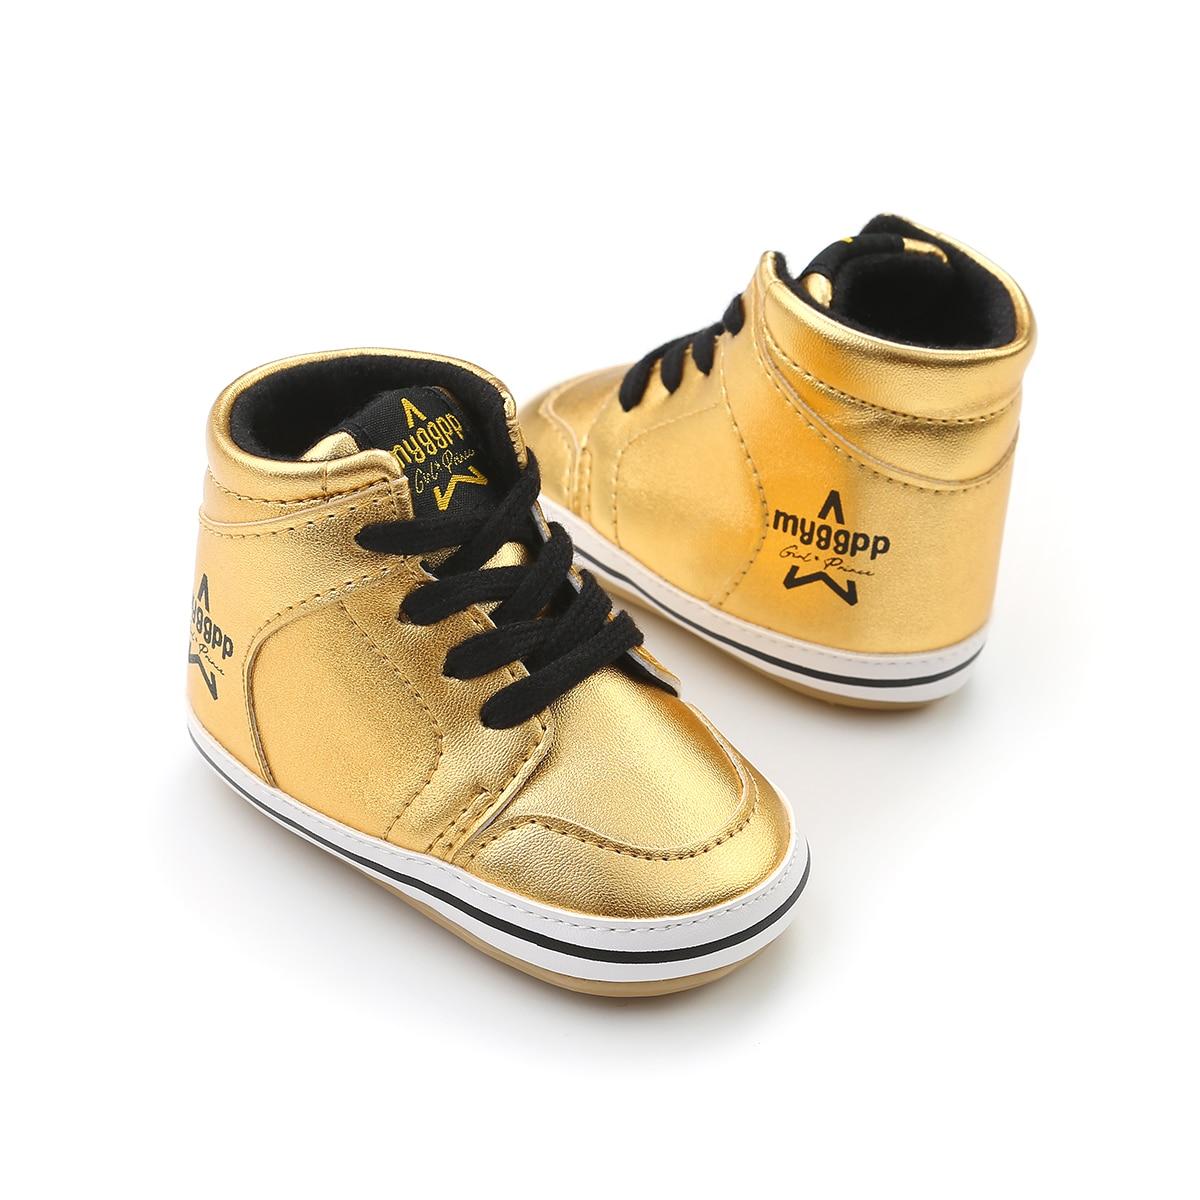 Newborn Baby Boy Girl Shoes Soft Sole White Pram Warm ...